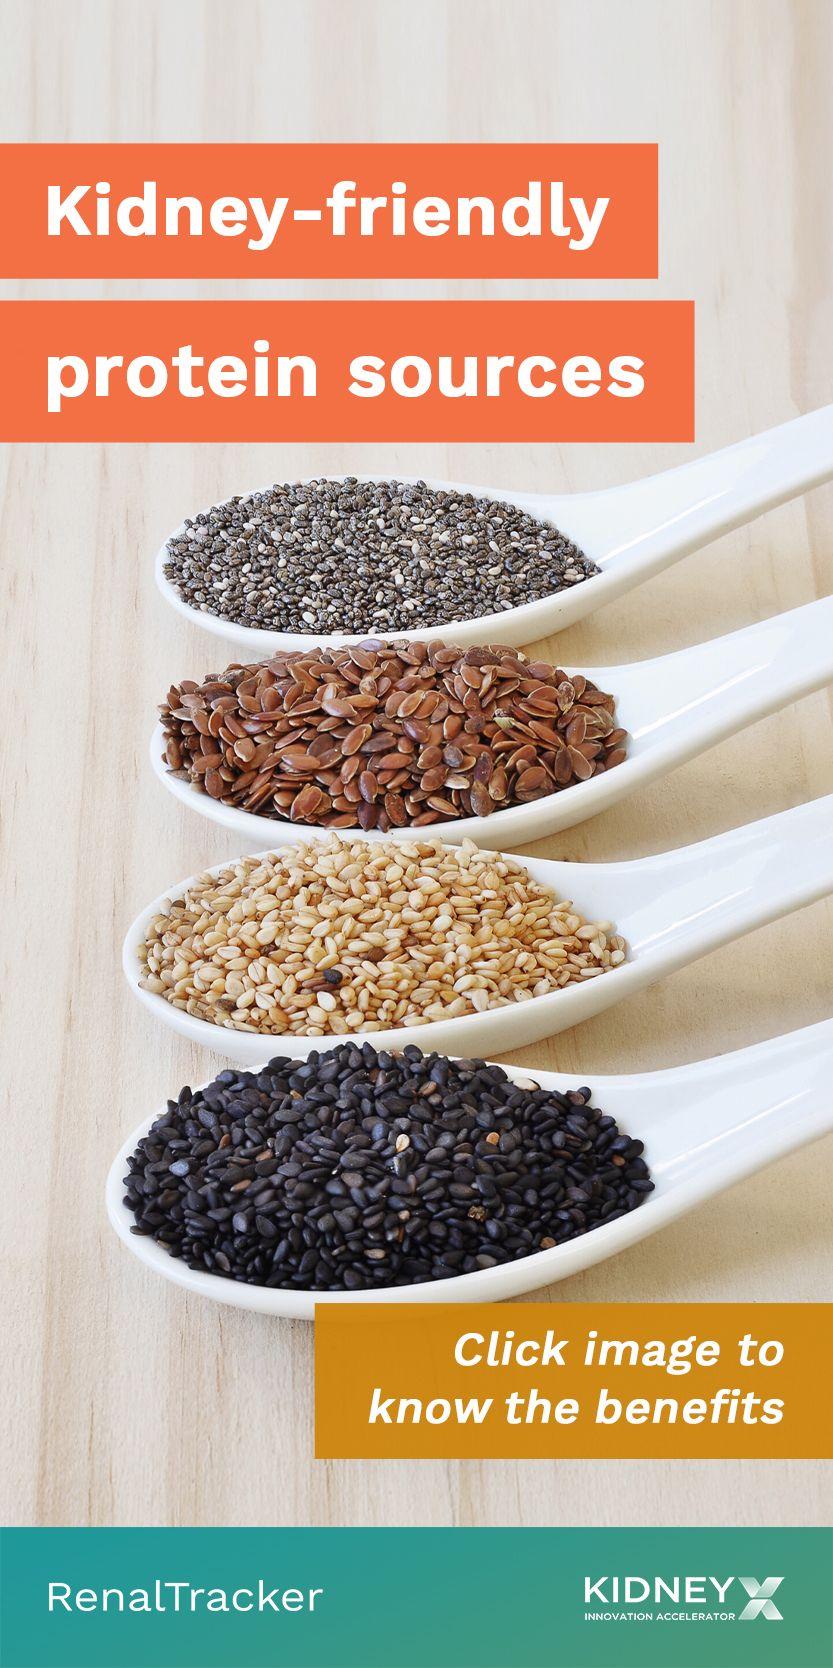 A kidneyfriendly lowprotein diet is important in people